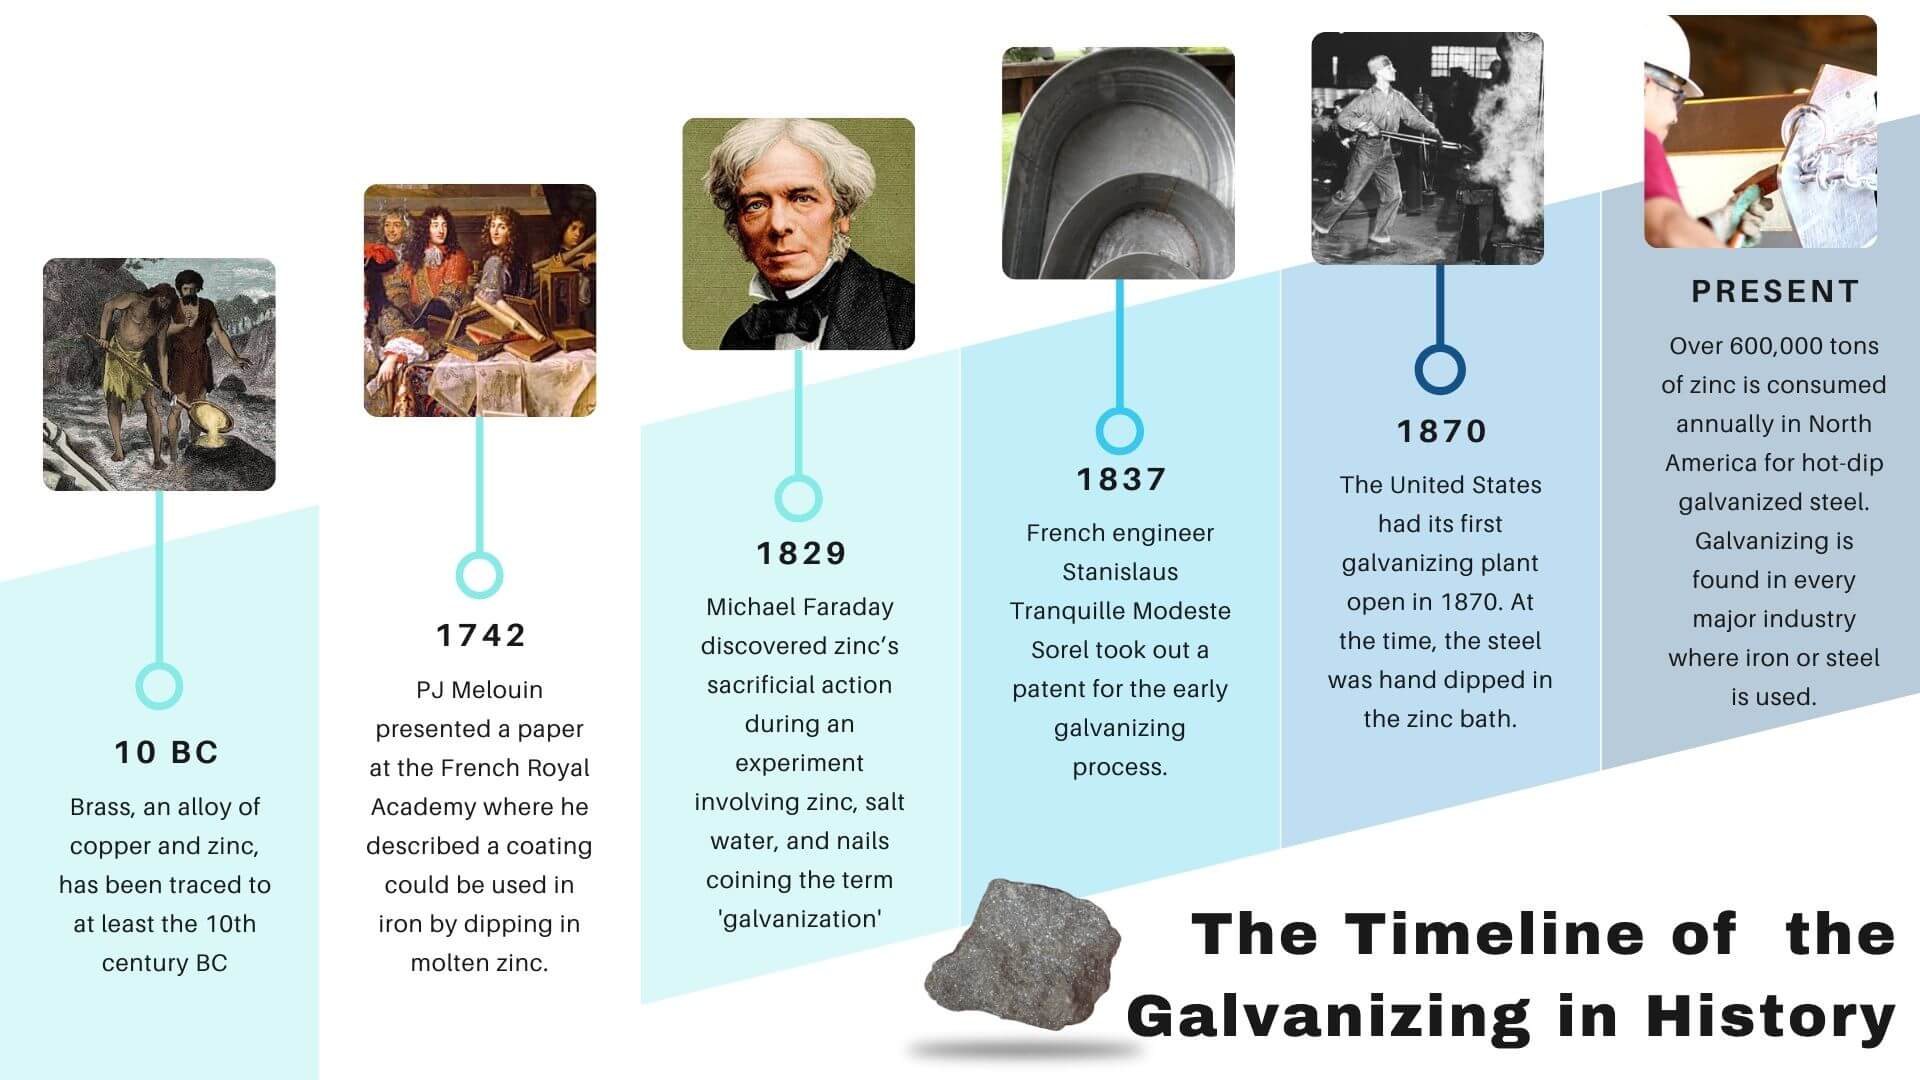 Historic Timeline of Galvanizing